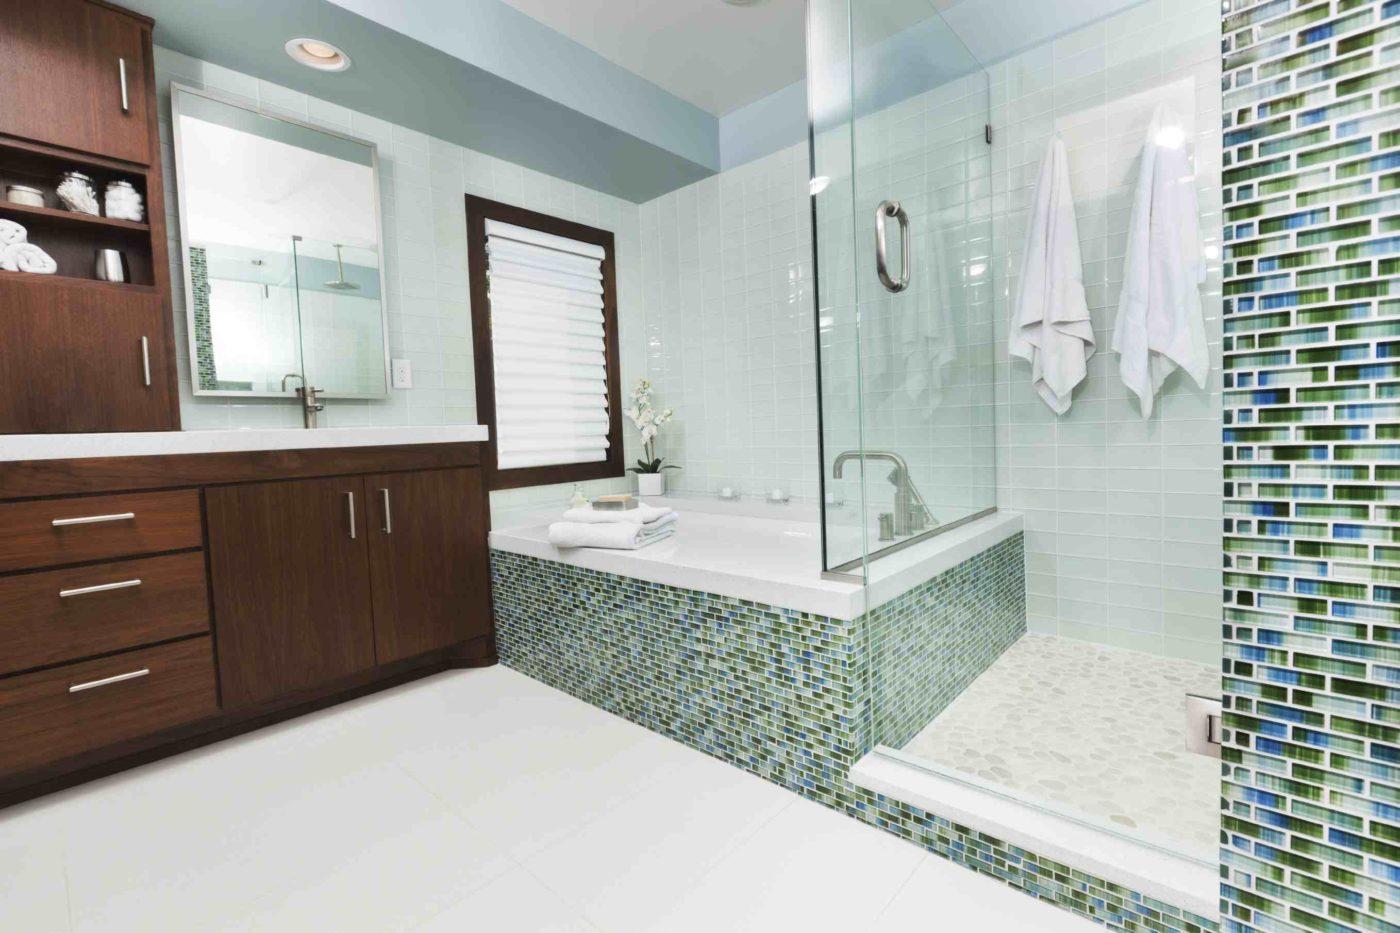 Bathroom Remodeling Contractor | Minnetonka, MN